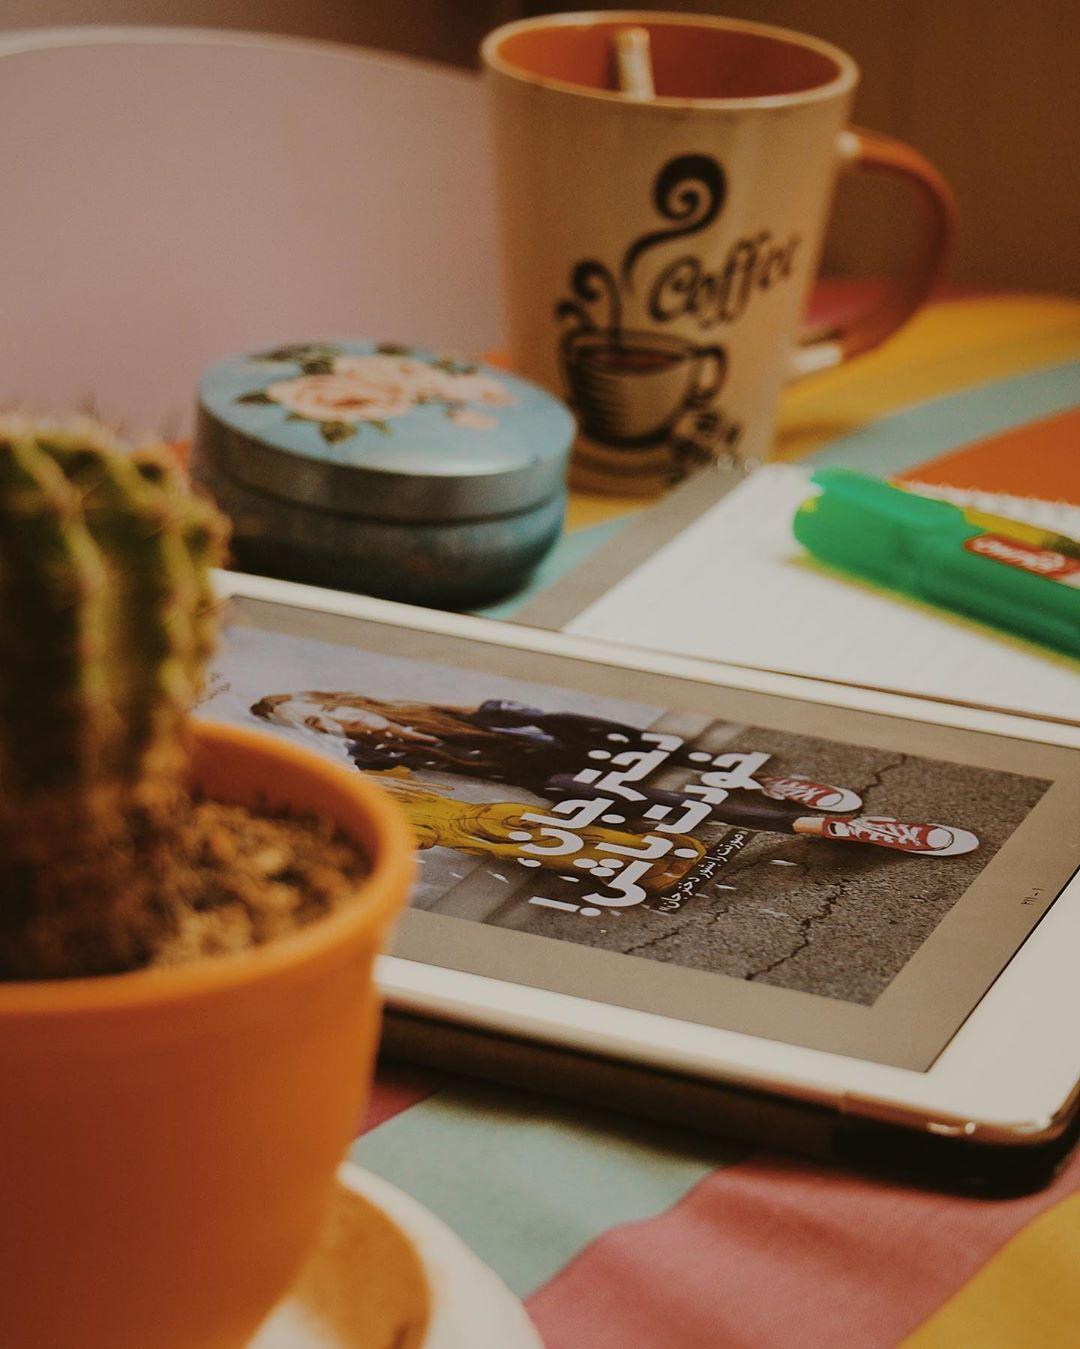 Get starte new book   . . . نوشته روی جلد : اگر میخواهید تبدیل به همان فردی 2